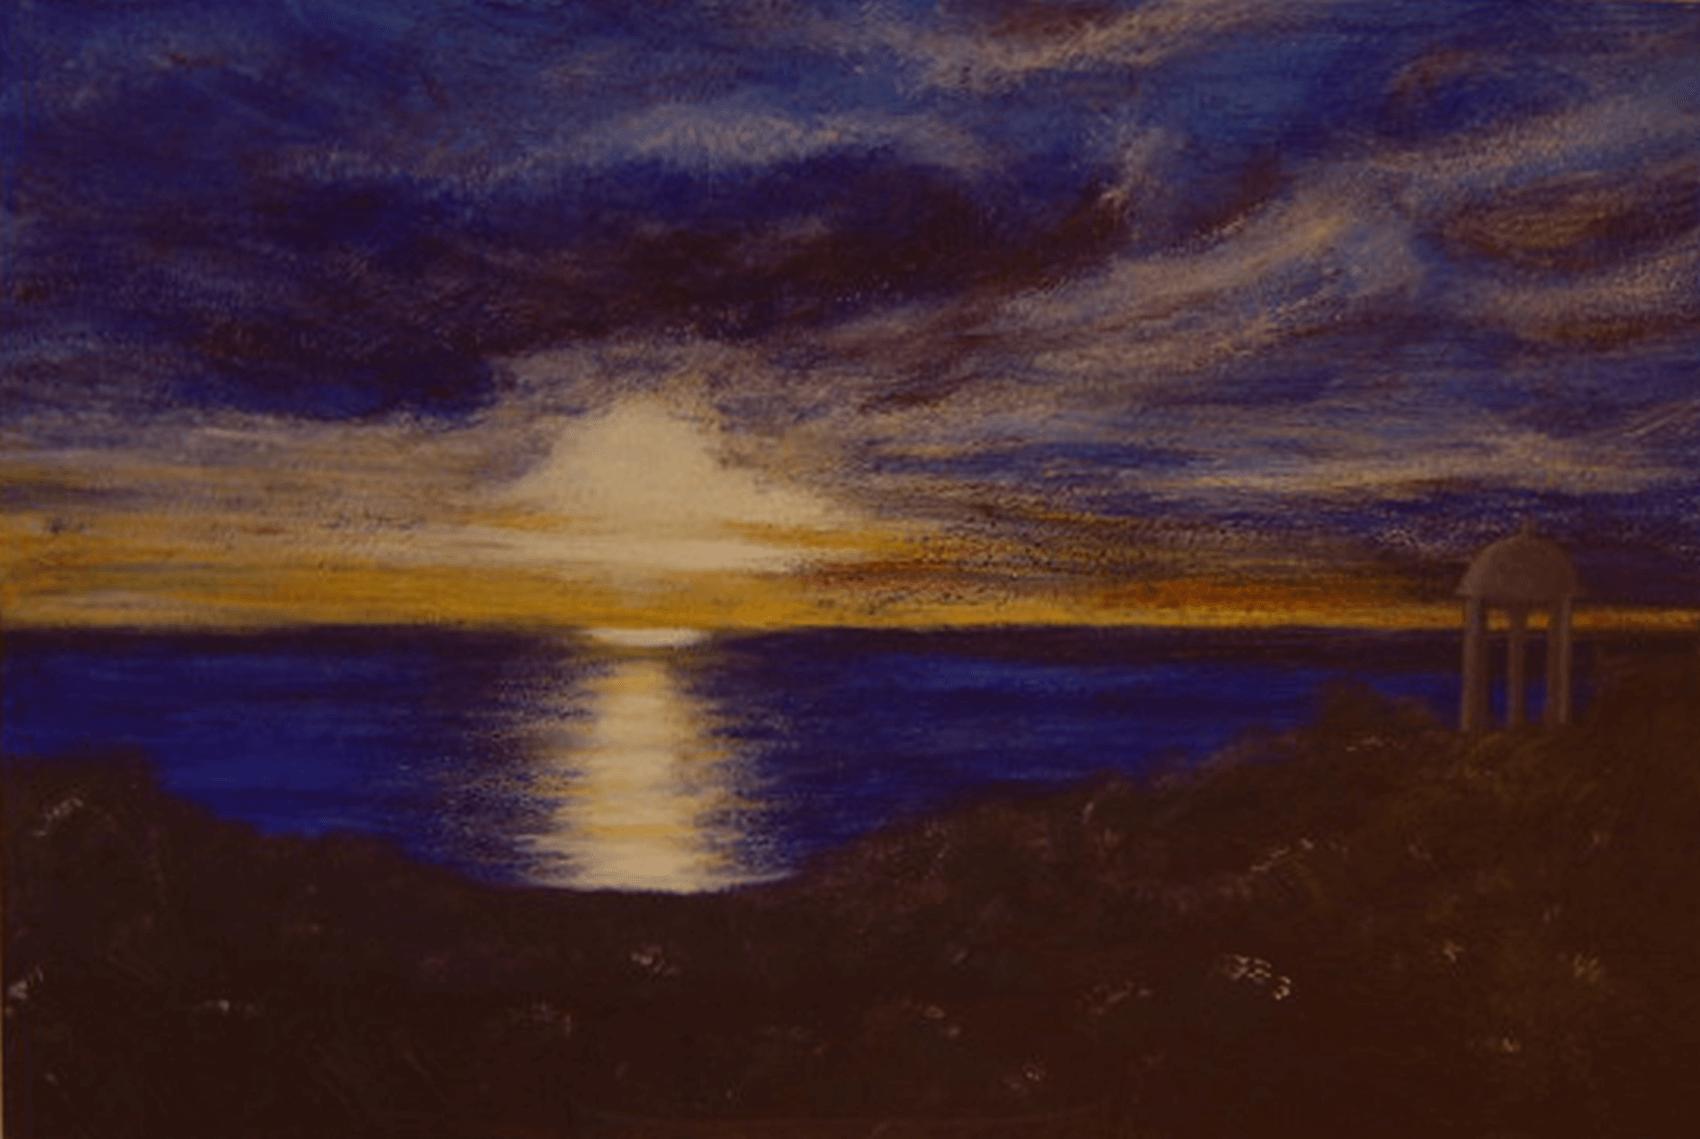 Sonnenuntergang am Meer « Atelier Sere